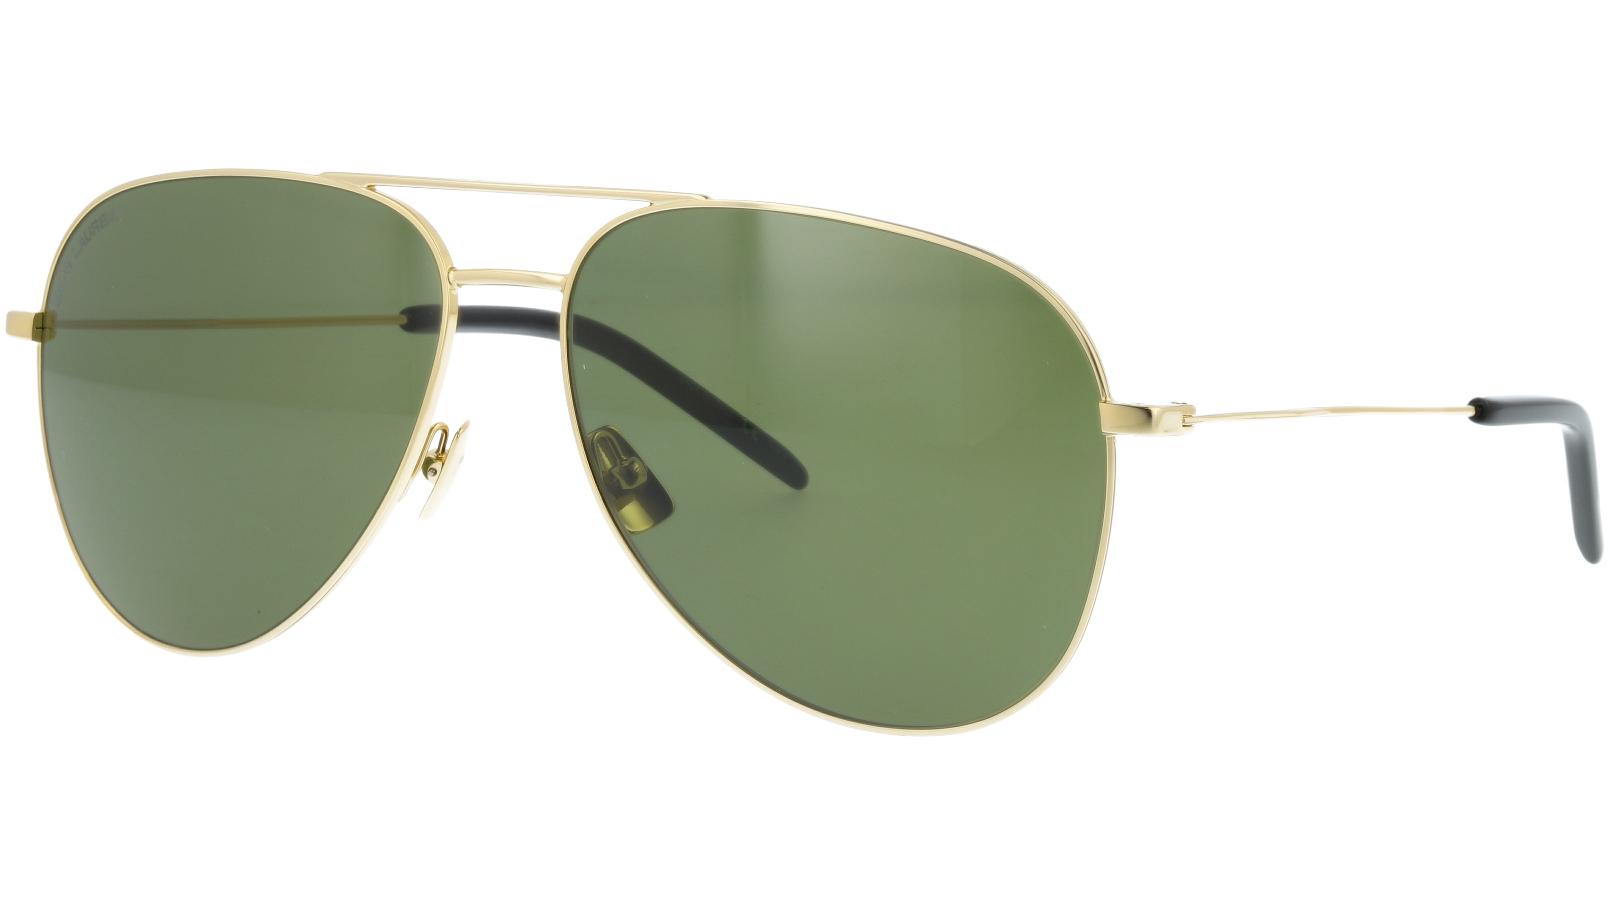 Saint Laurent CLASSIC11 008 59 Gold Sunglasses